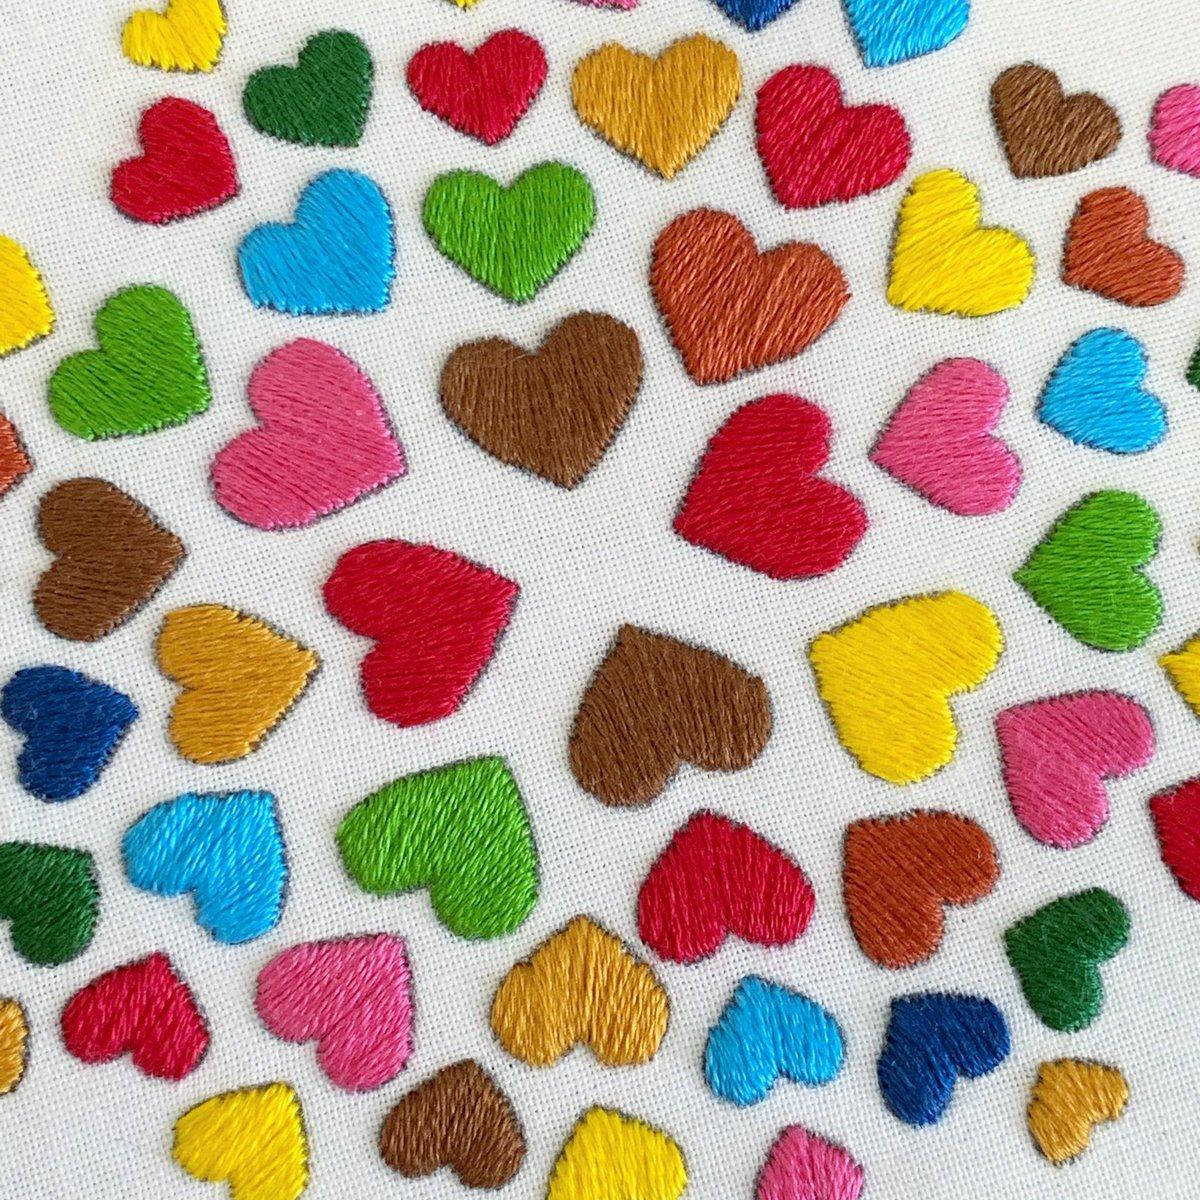 Hearts pattern coming soon....♥️   #heart #hearts #colorfulhearts #heartburst #diyhearts #heartembroidery #heartpattern #embroiderykit #handembroidery #makeyourown #diykit #craftkit #workinprogress #DIY #embroidery